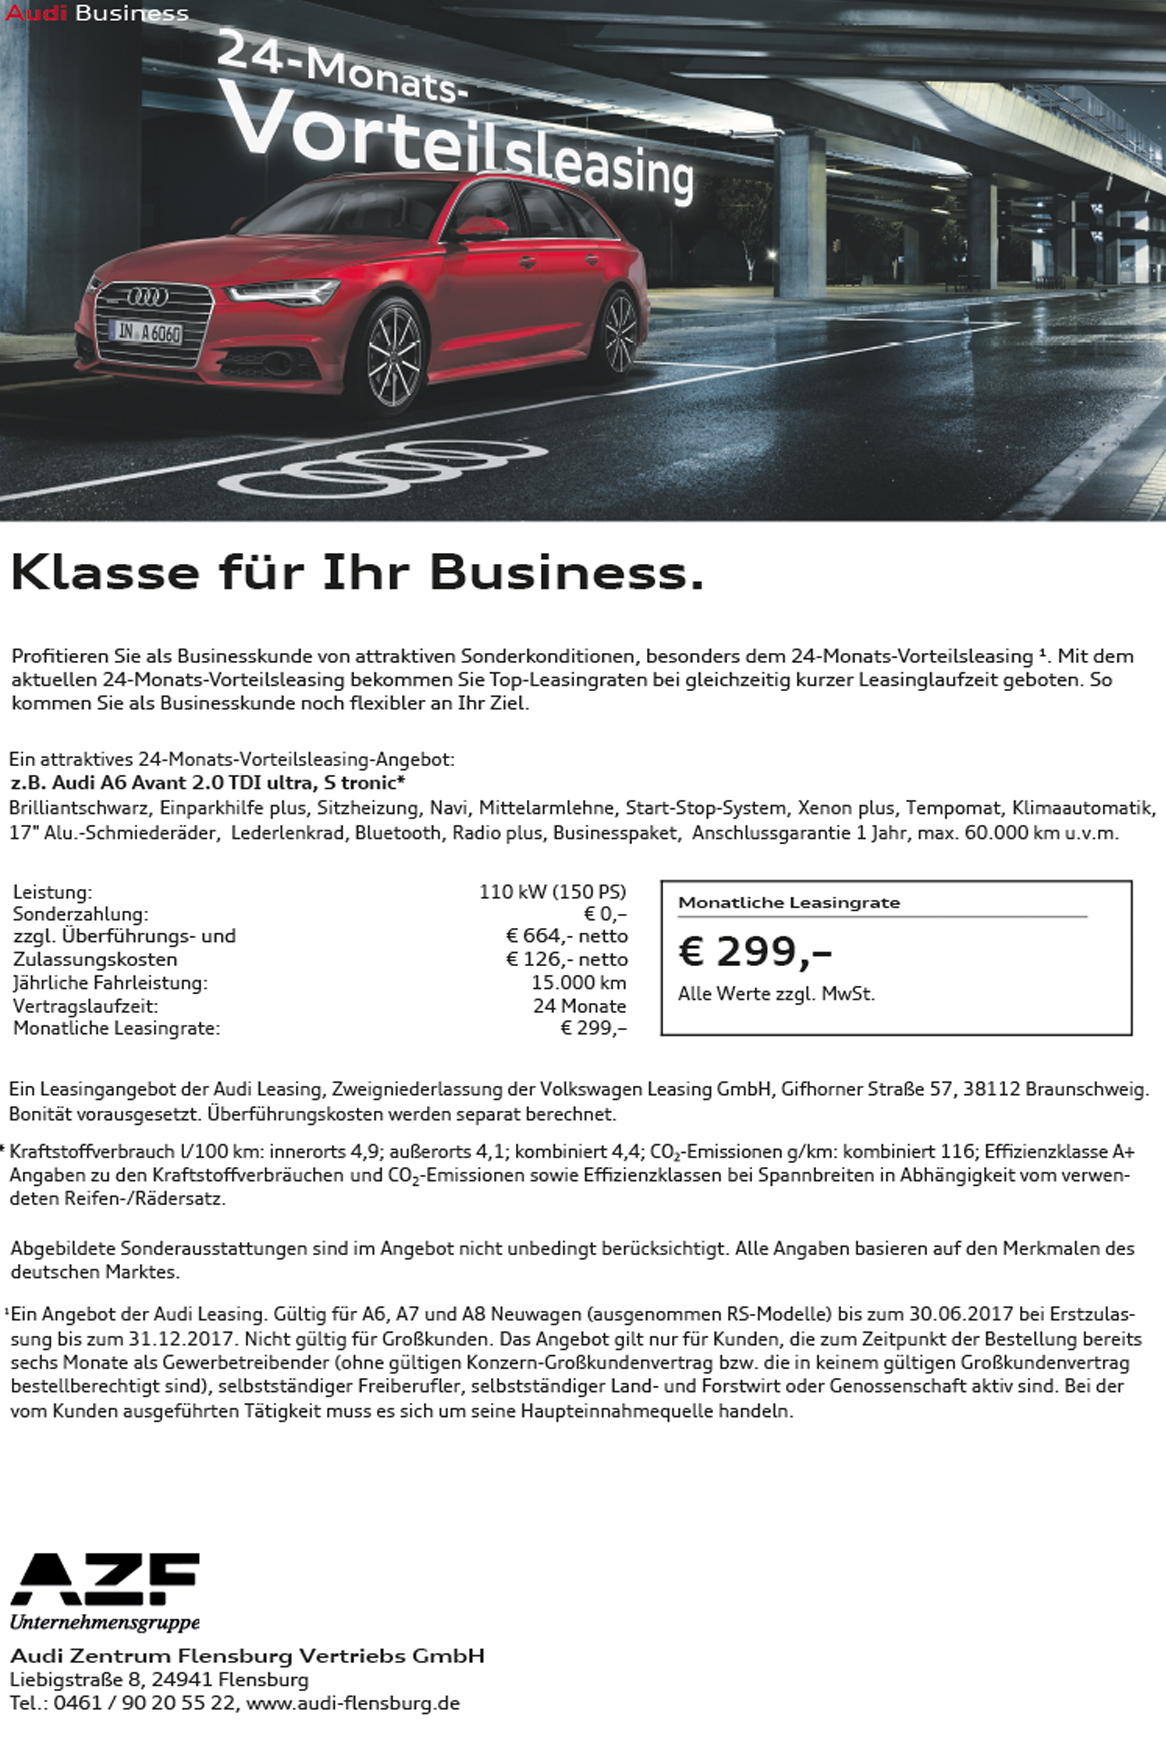 Audi a6 avant leasing angebote 7